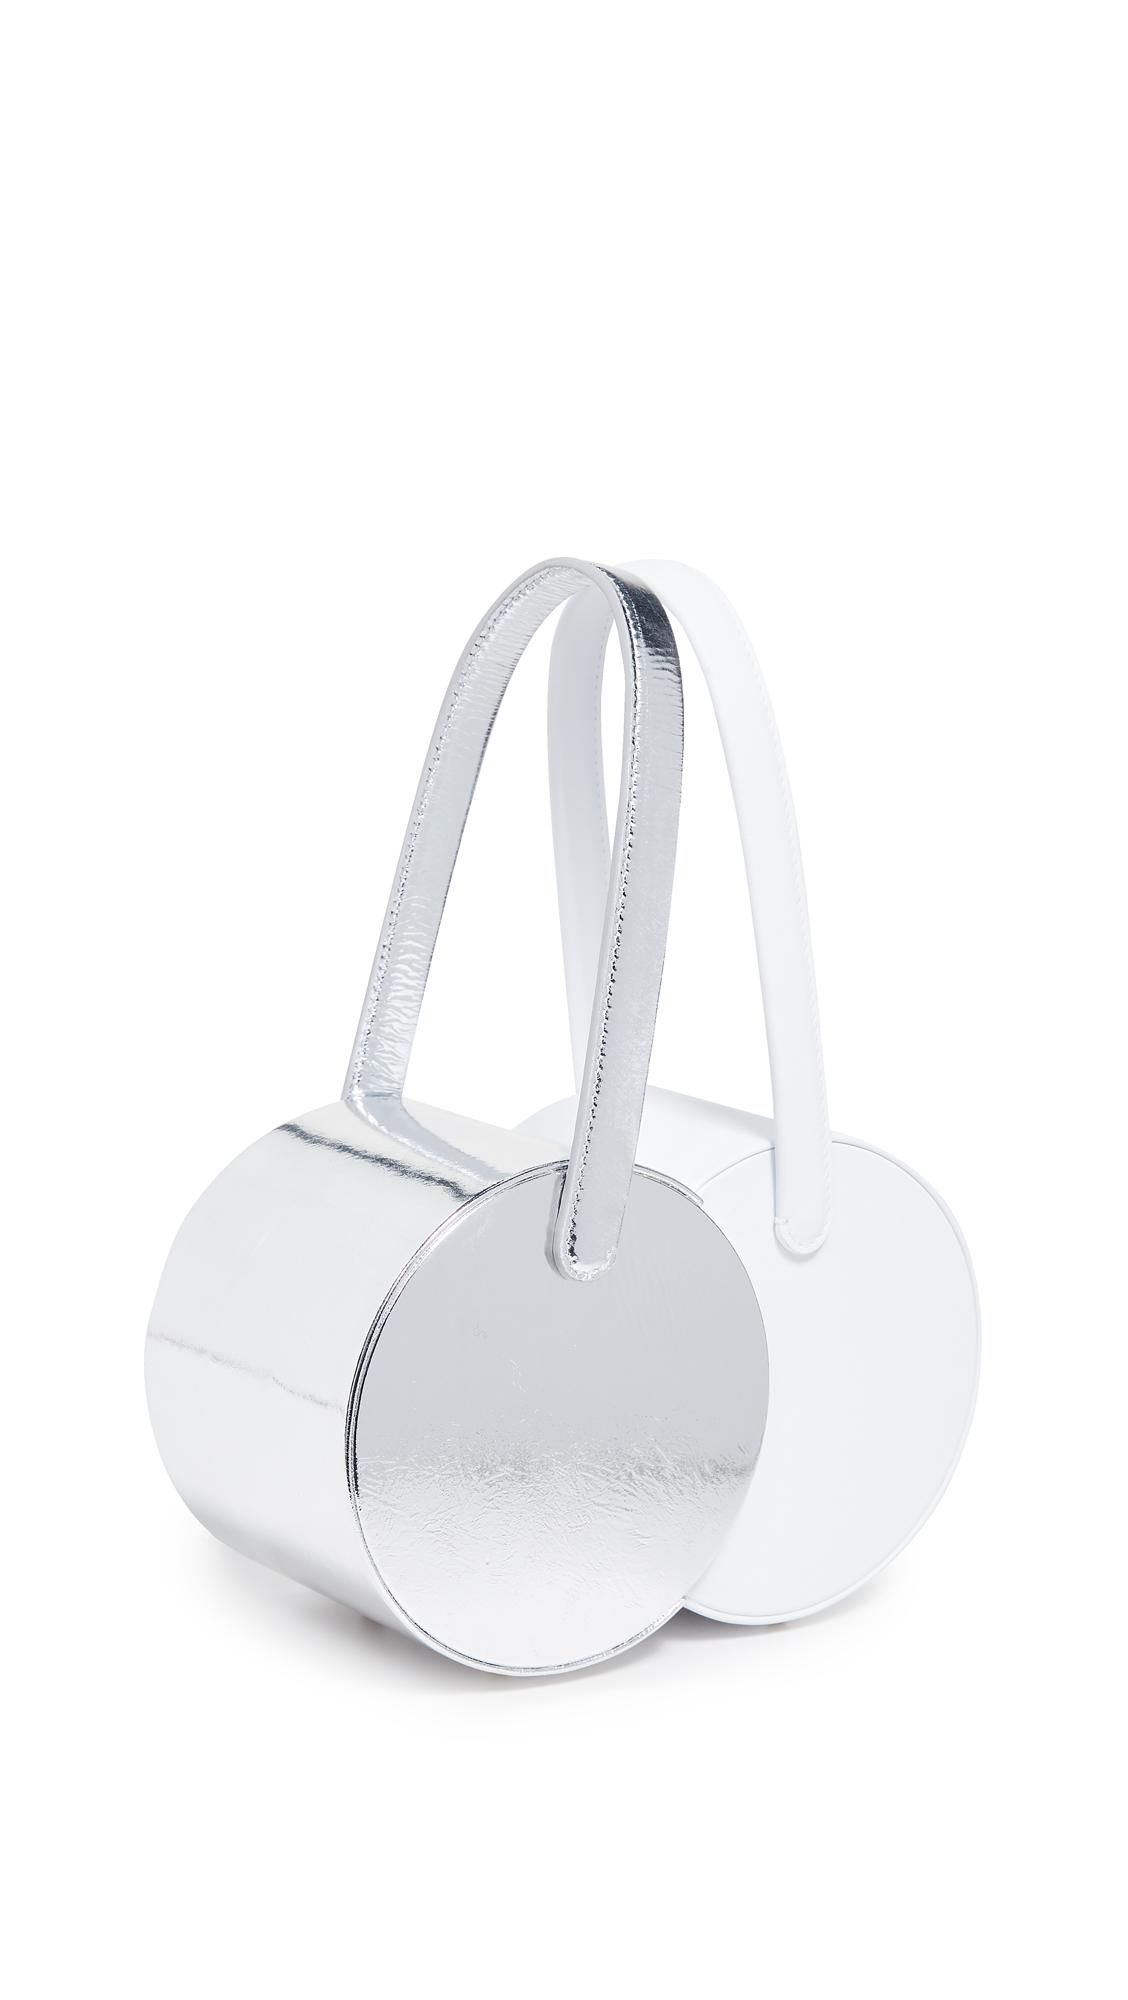 Edie Parker Double Shot Bag - Silver/White